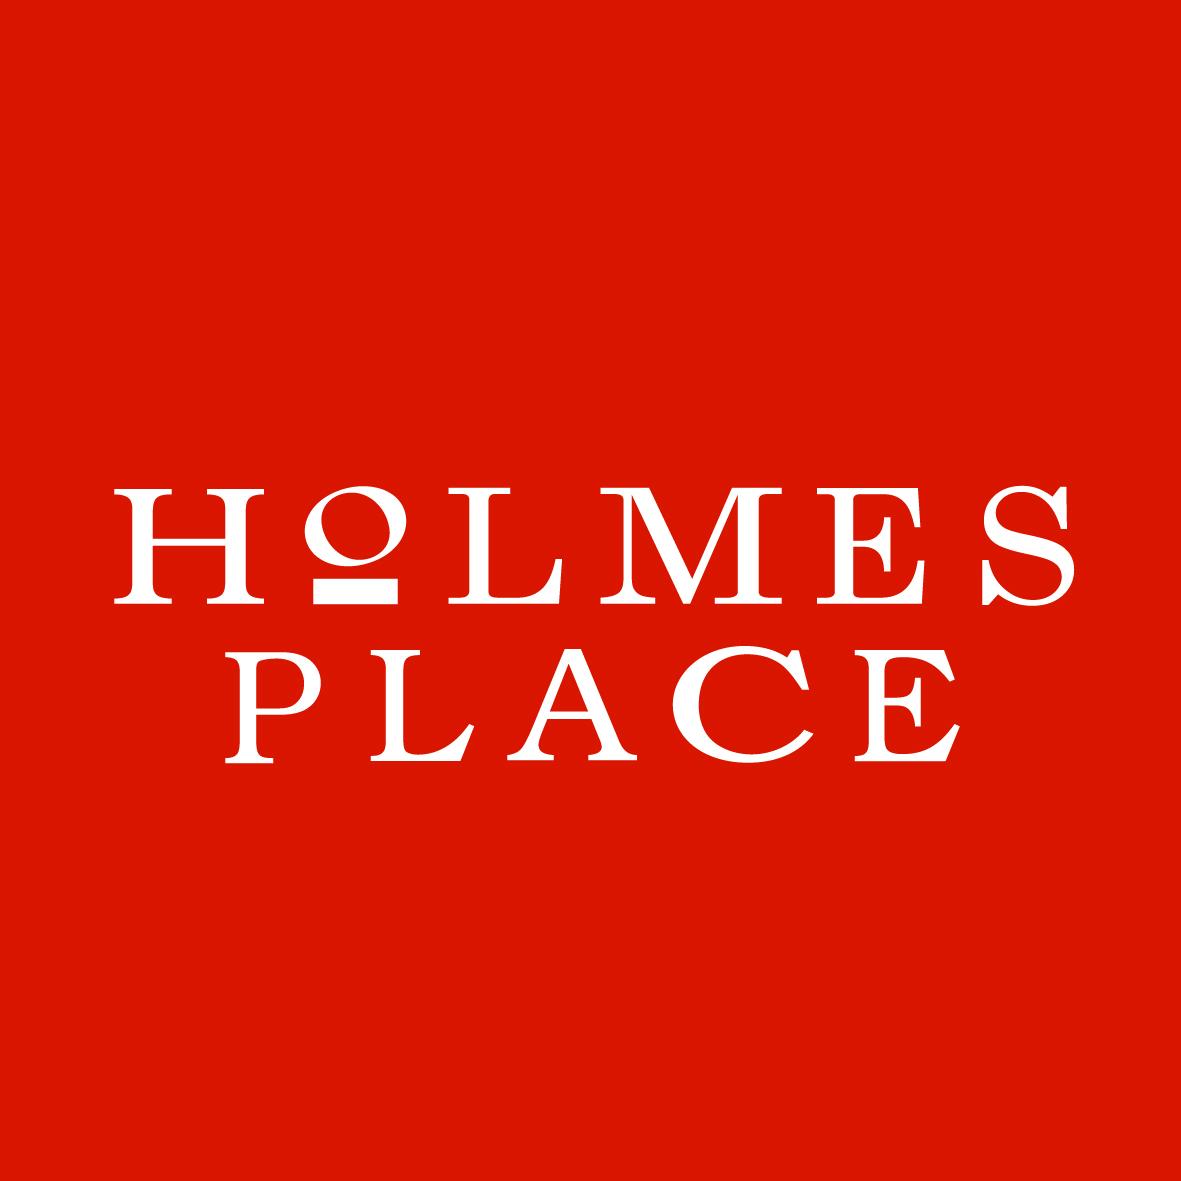 Holmes-Place-Logo_0_90_100_15.jpg